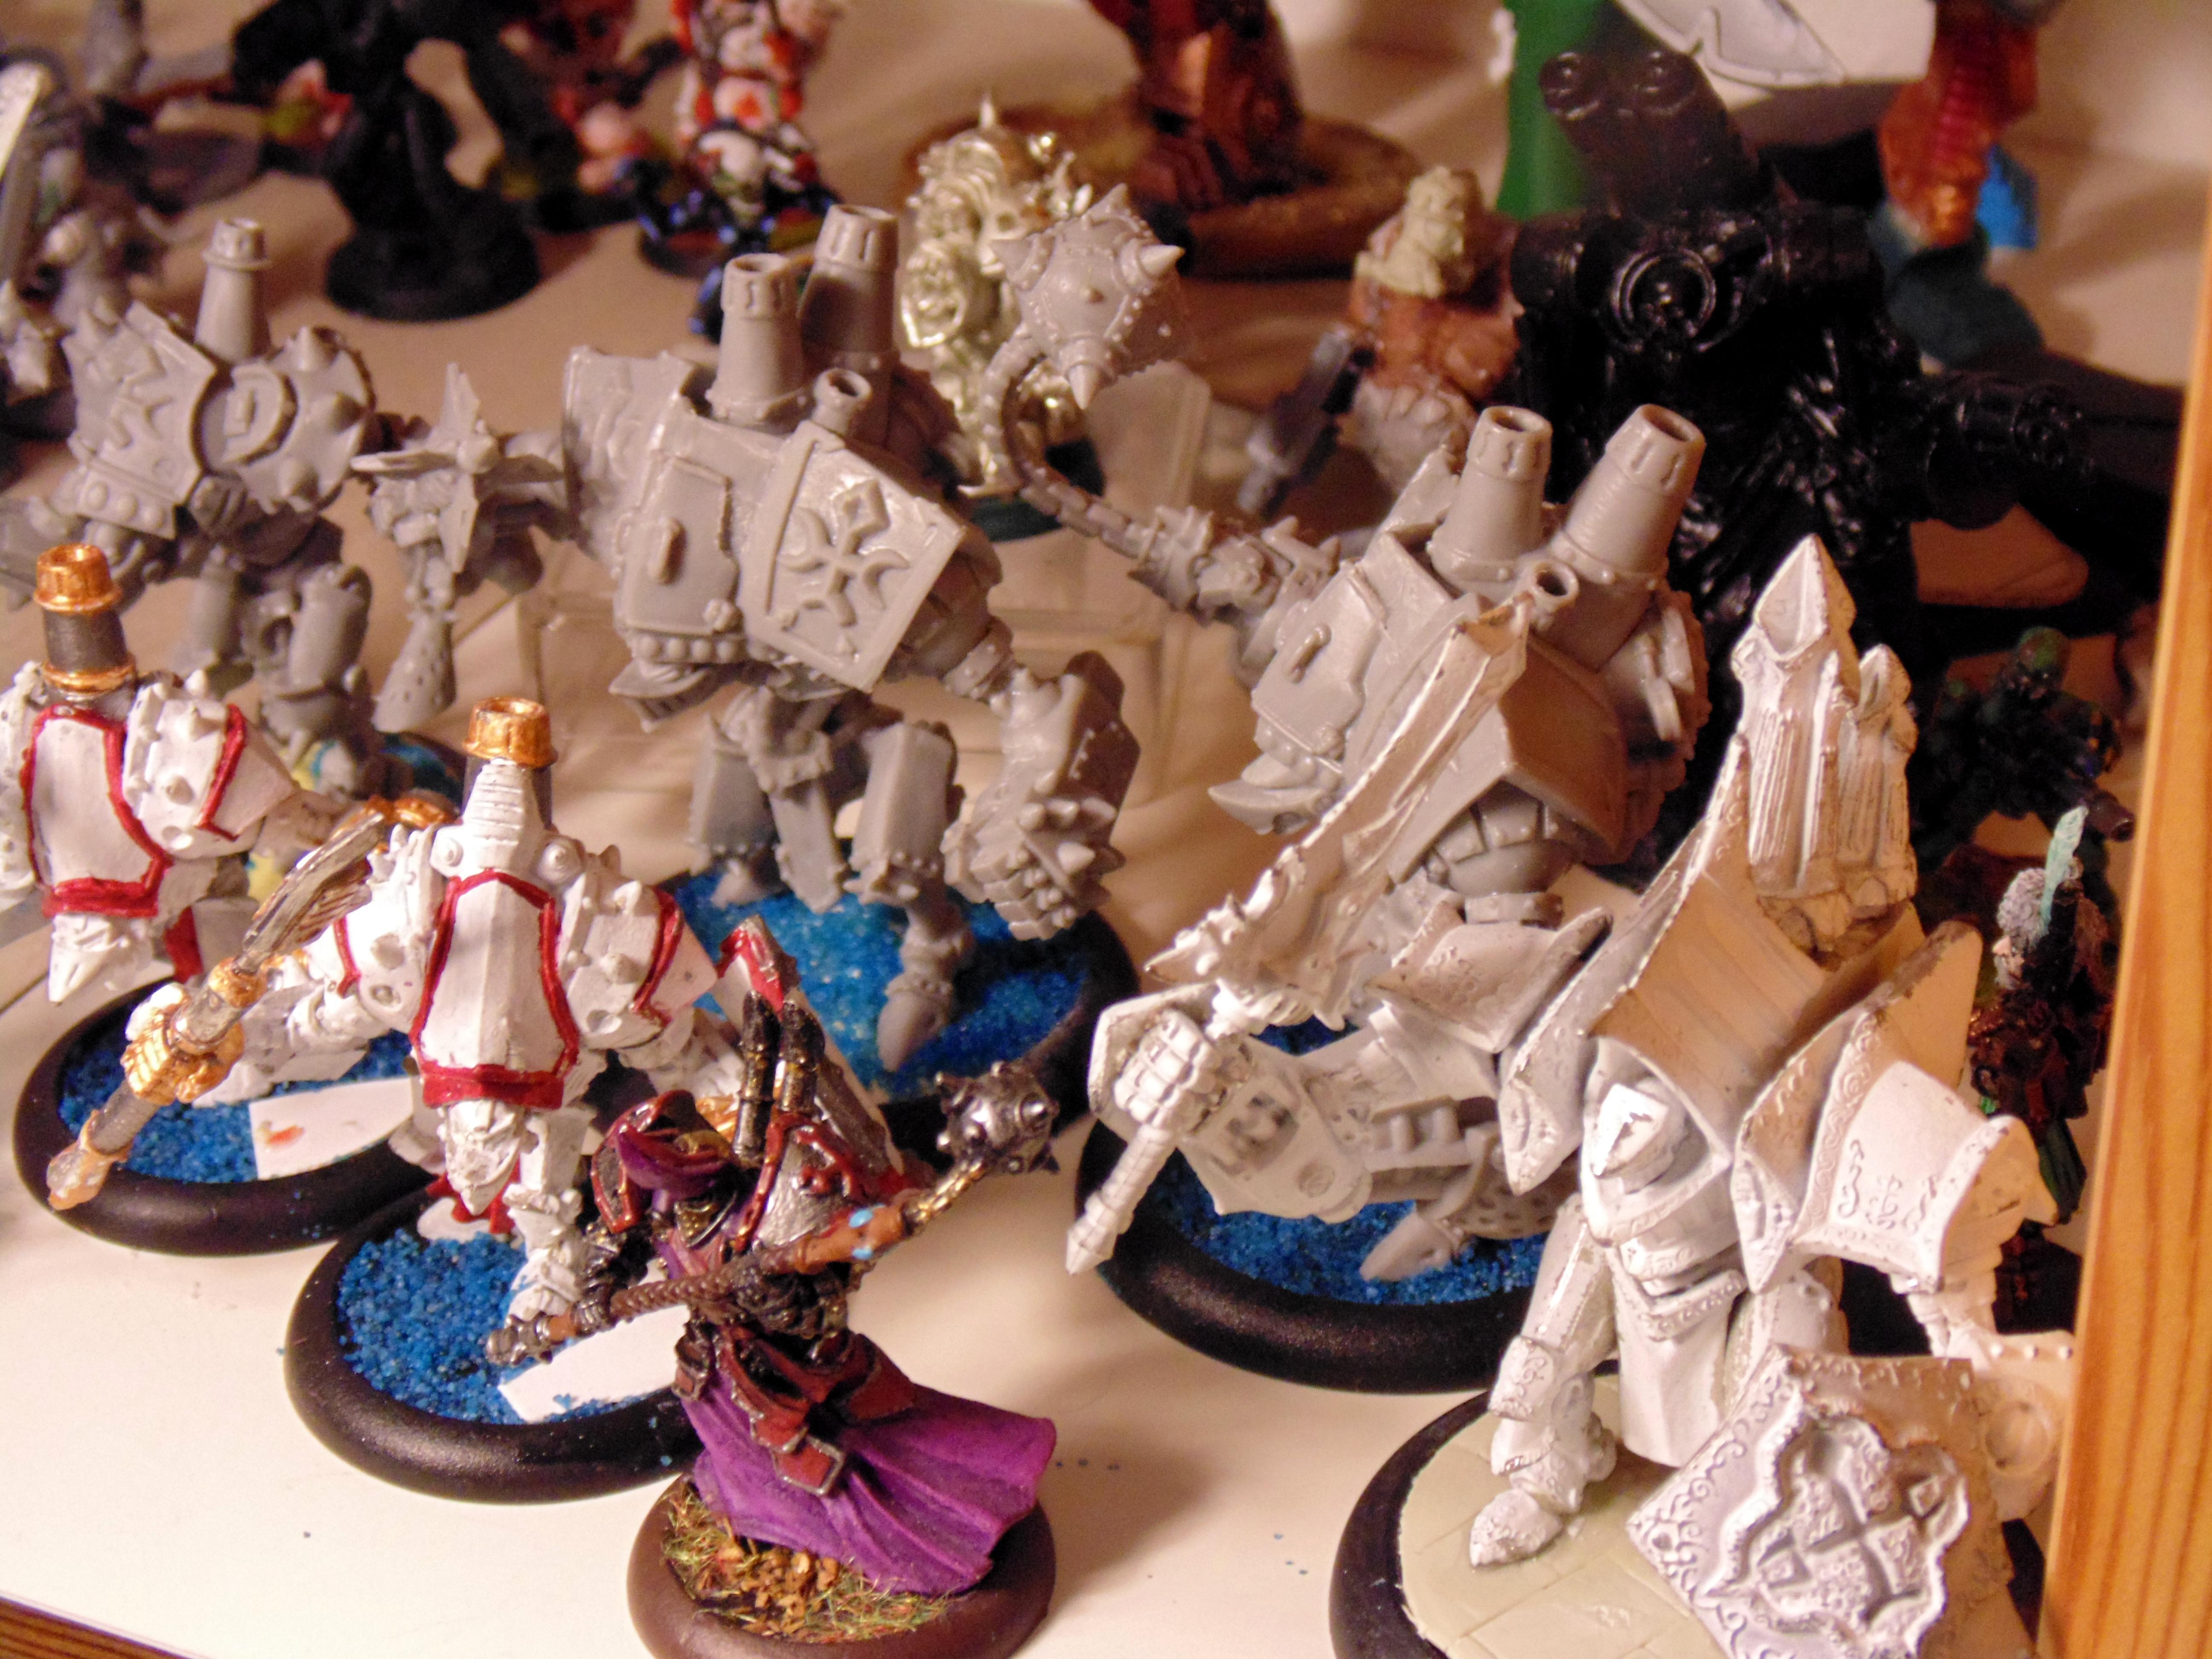 Bize, Bonejack, Caster, Comparison, Conversion, Cryx, Cygnar, Deathjack, Feora, Helljack, Khador, Khorne, Kovnik, Kreoss, Man-o-war, Manowar, Monster, Protectorate Of Menoth, Protectoriat, Scratch Build, Size, Sorscha, Warajck, Warcaster, Warjack, Warmachine, Wreck